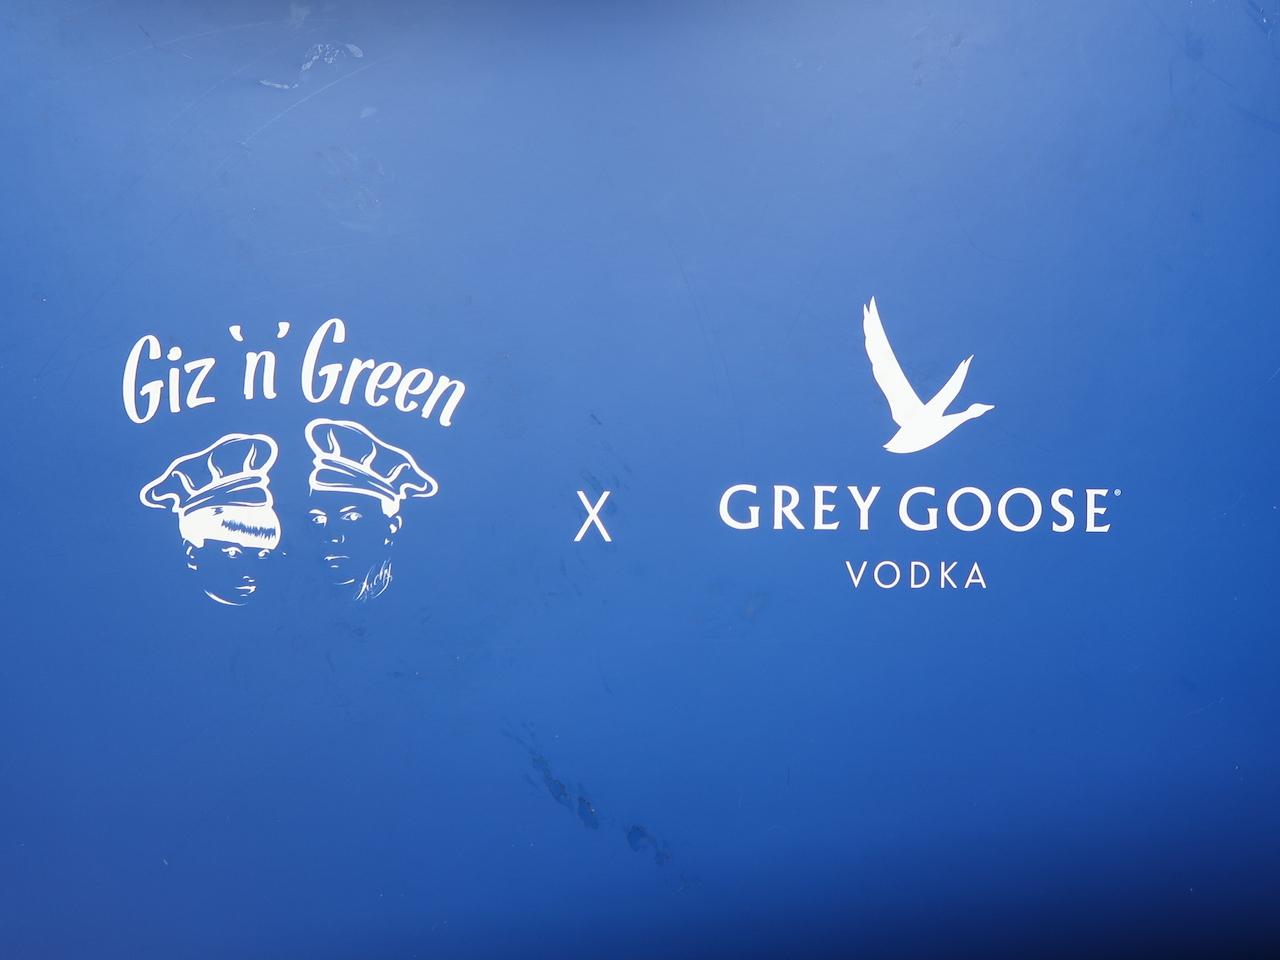 Giz n Green and Grey Goose box